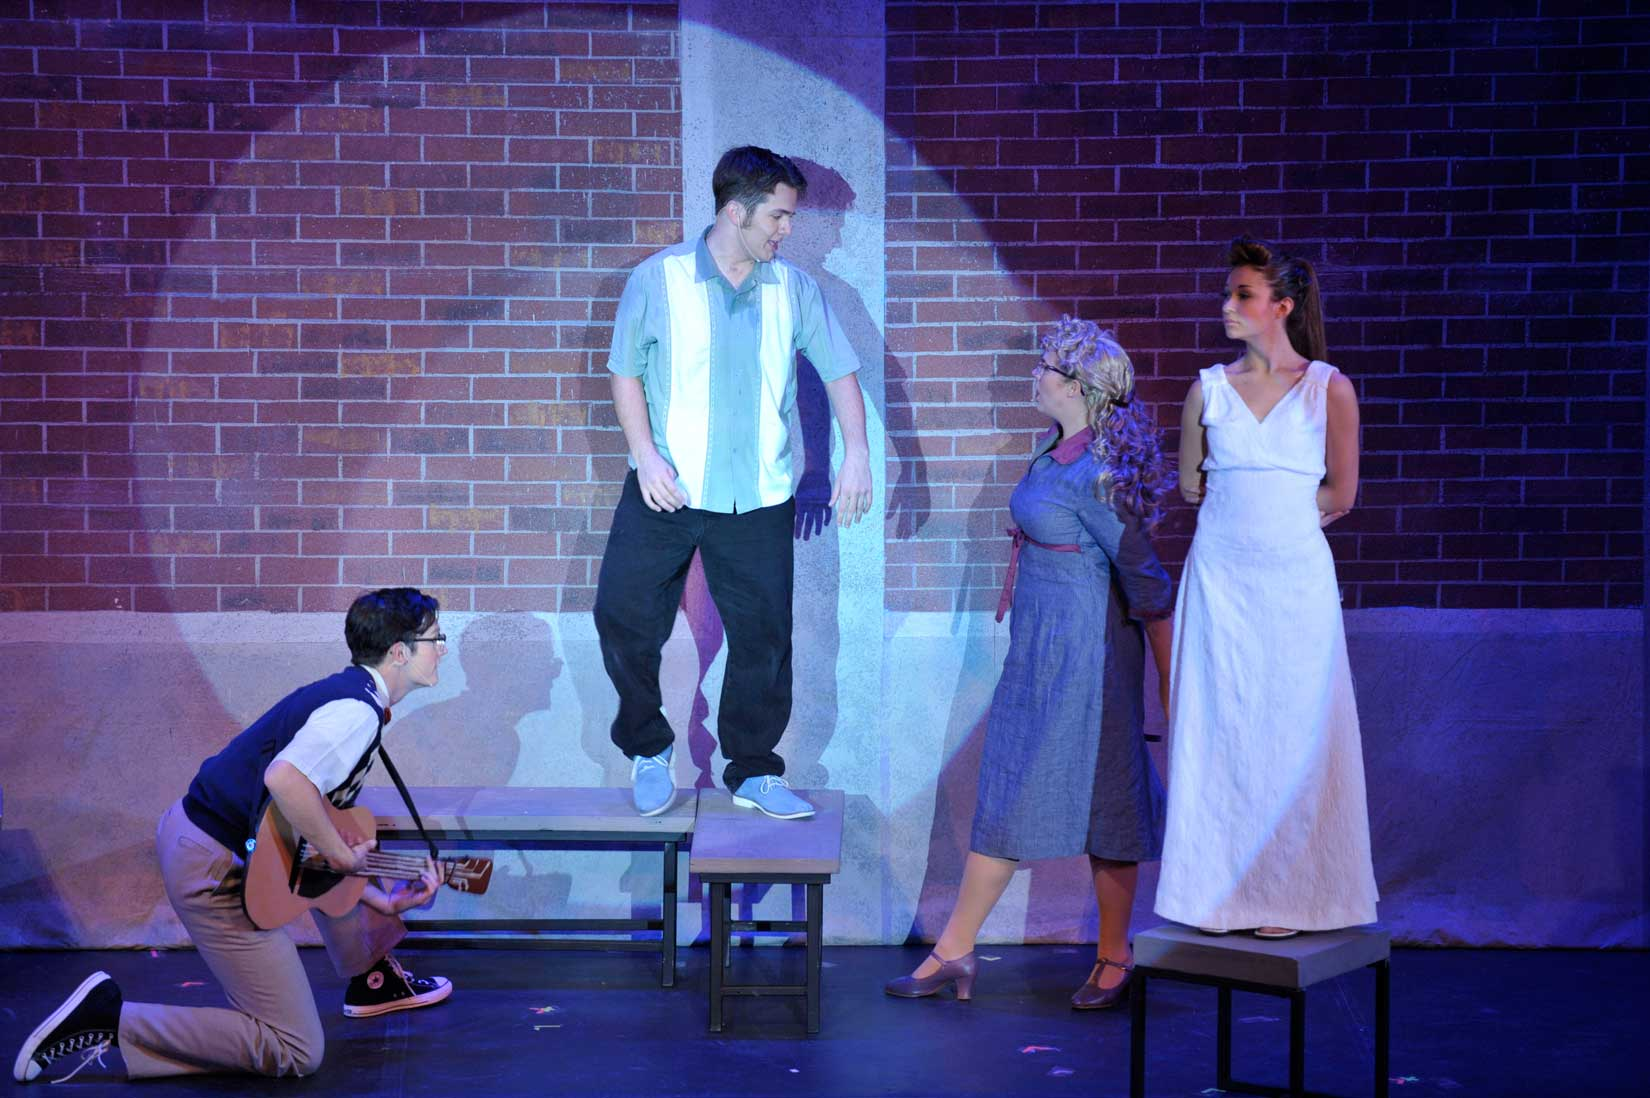 theatre show at emporia state university